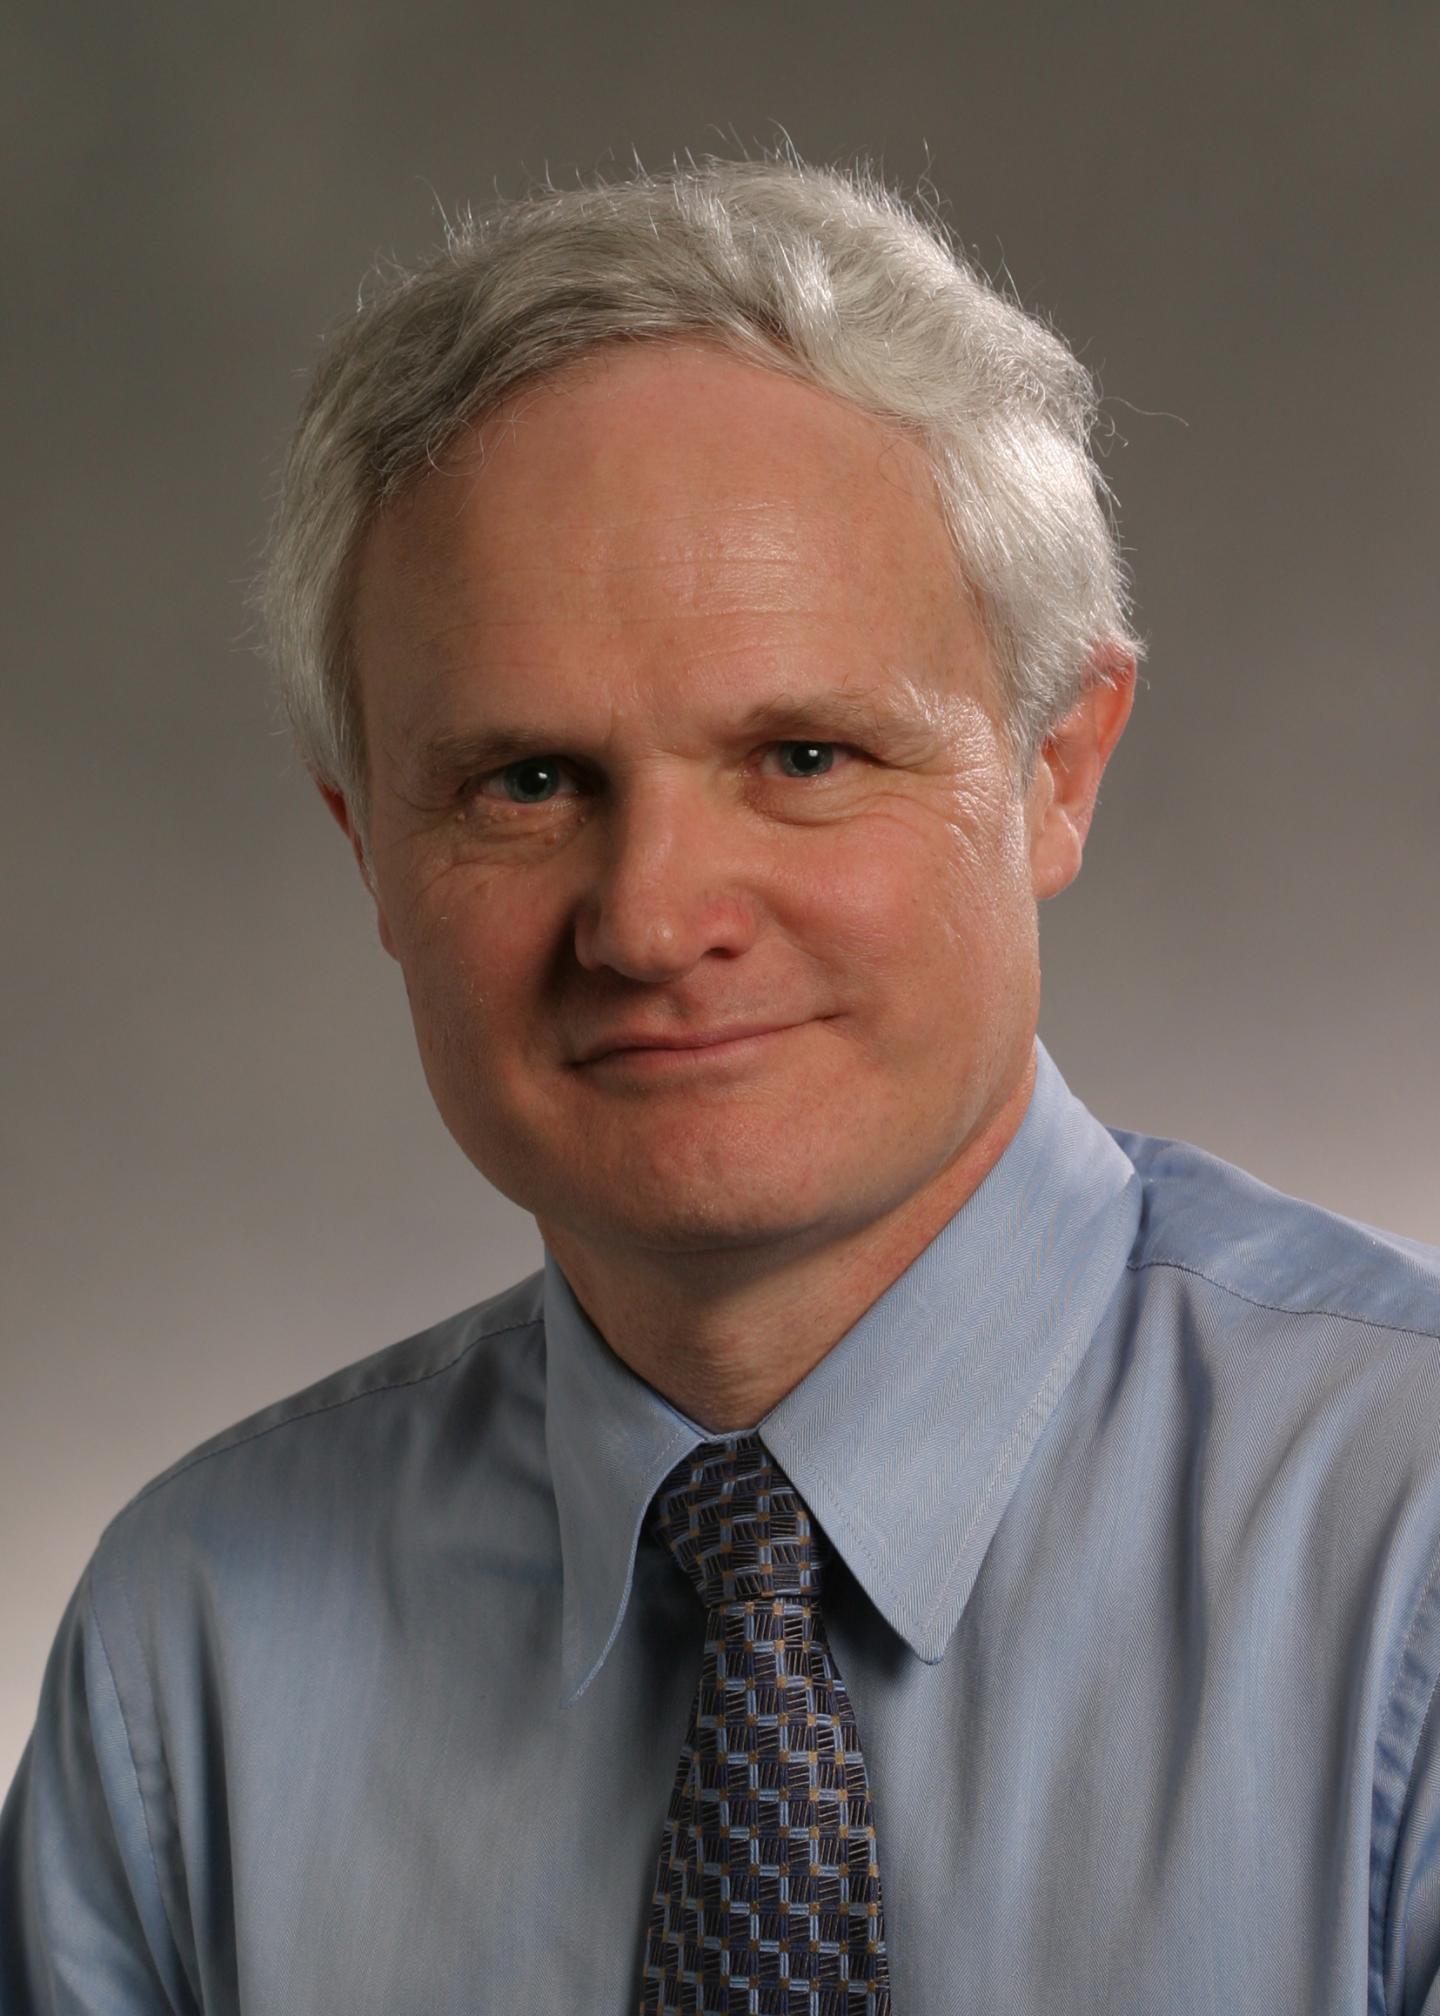 Kurt Kroenke, M.D., Regenstrief Institute